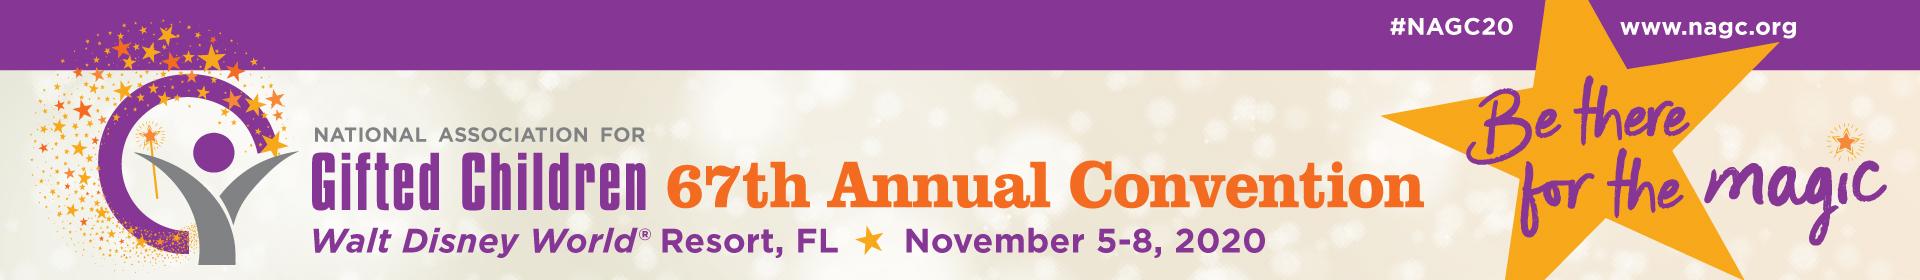 NAGC 67th Annual Convention November 5-8, 2020